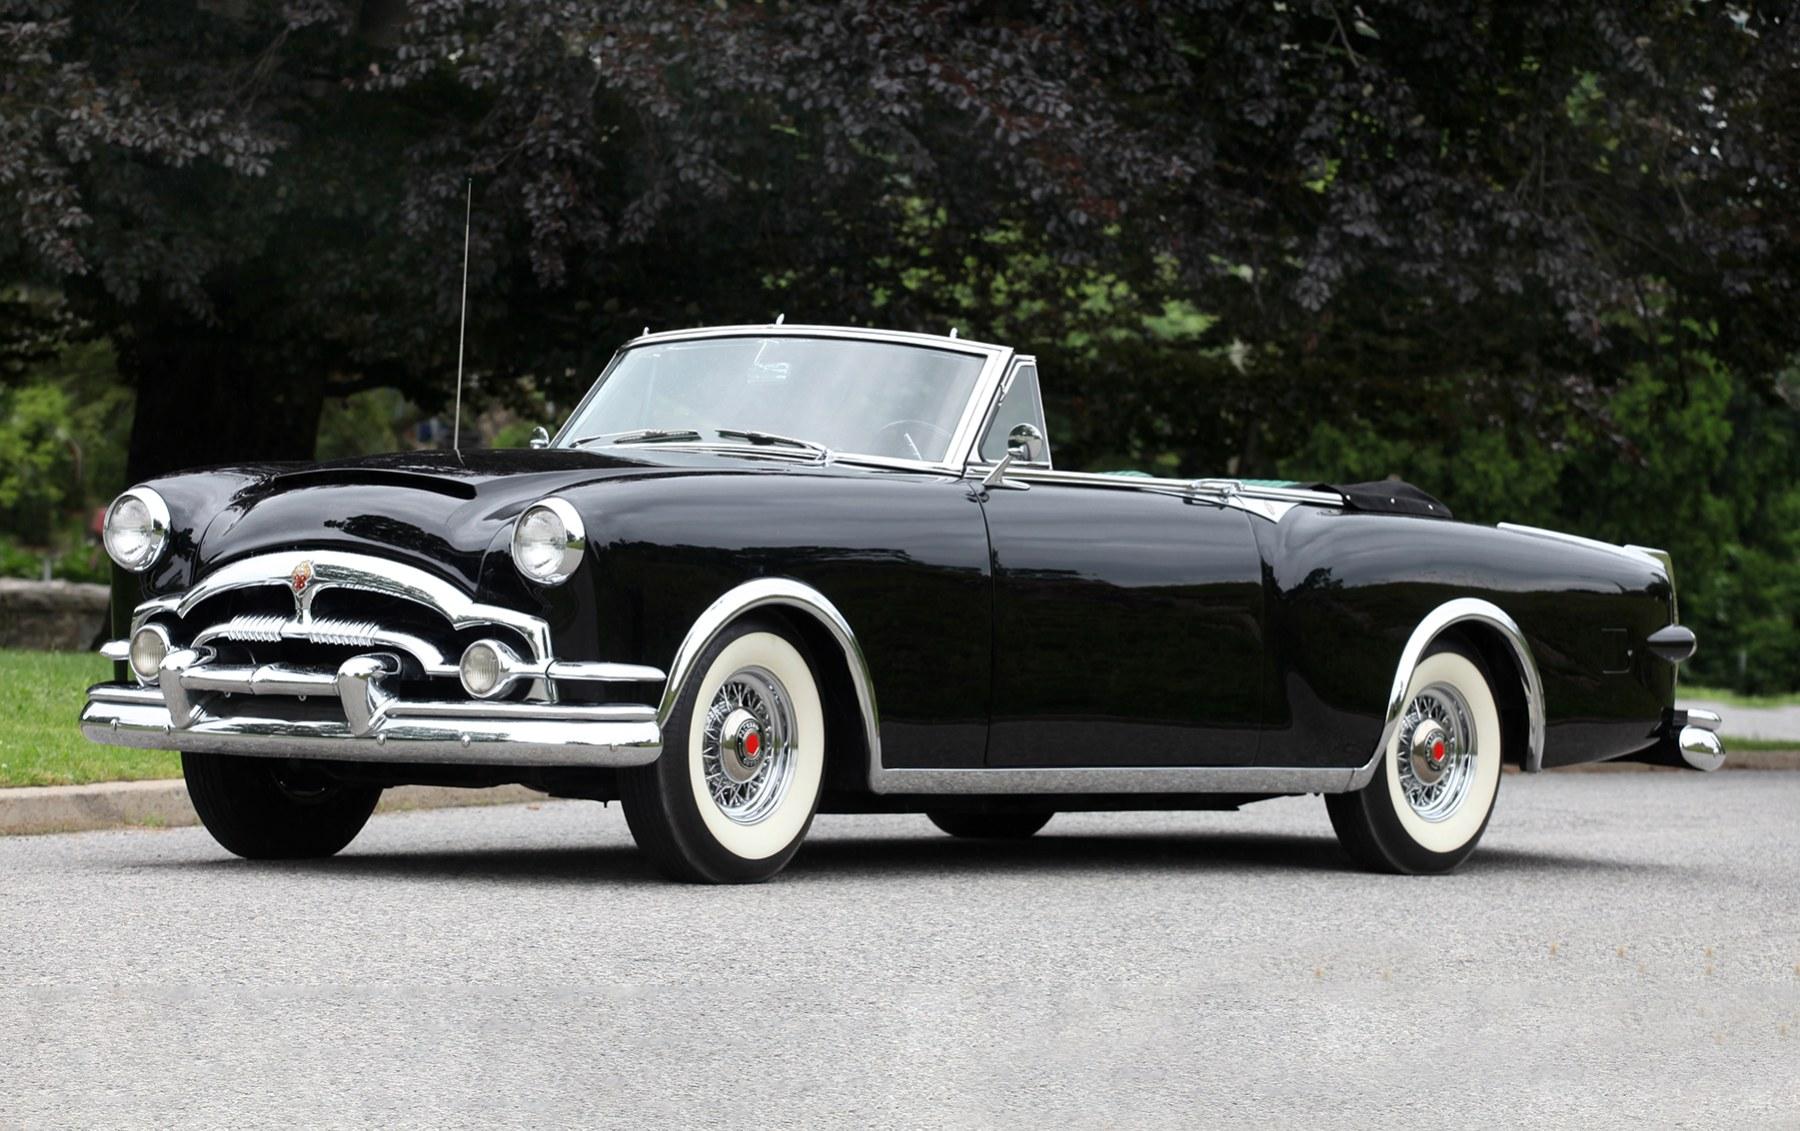 1953 Packard Carribbean